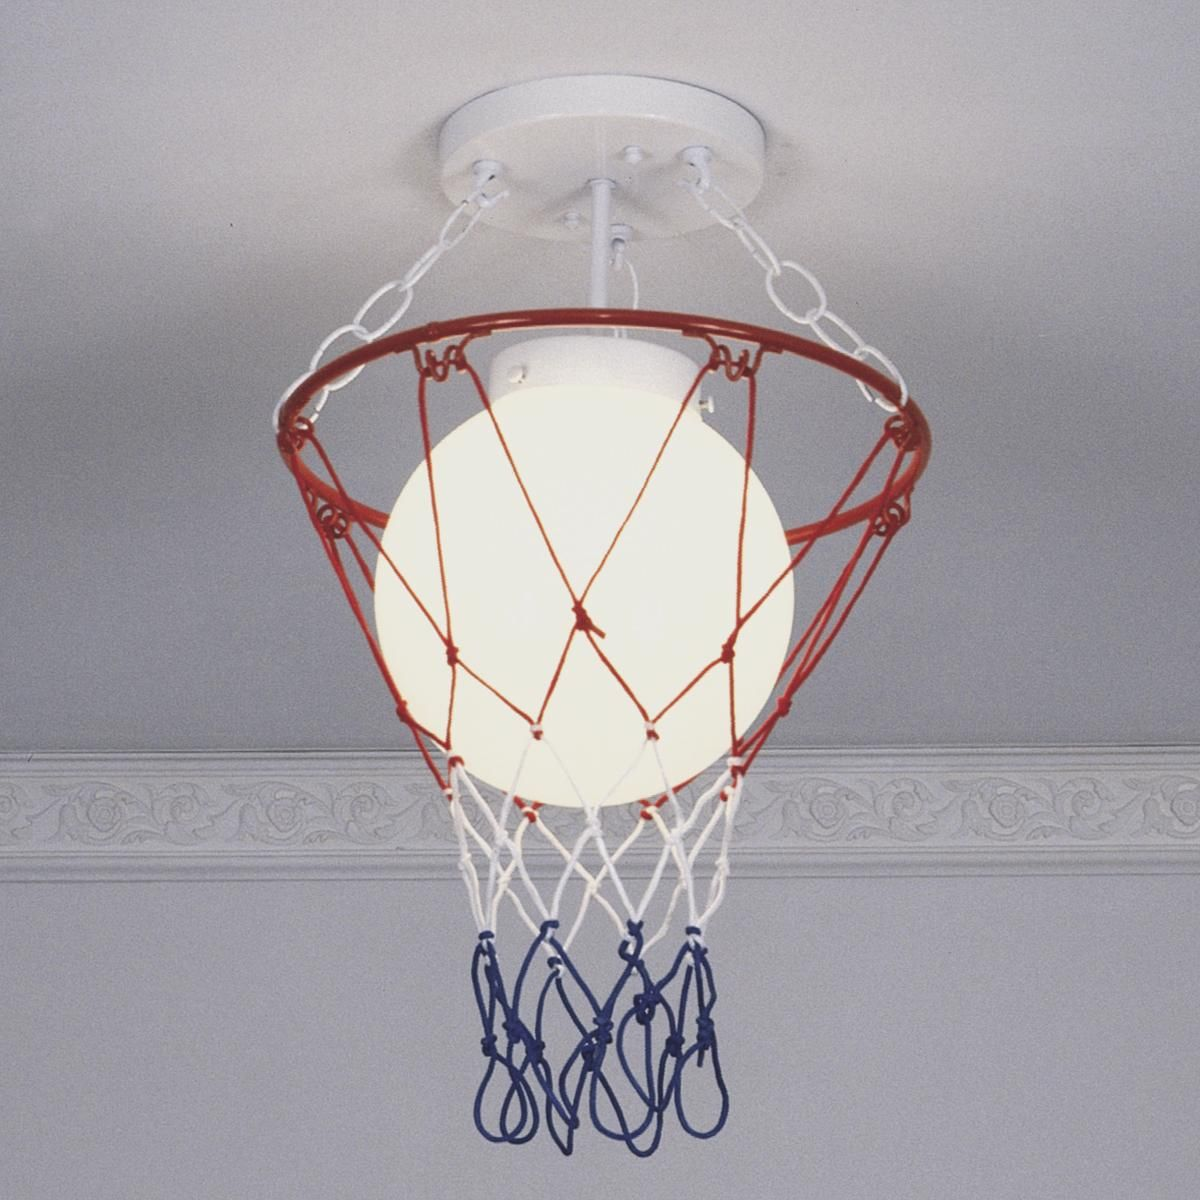 Basketball And Net Ceiling Light